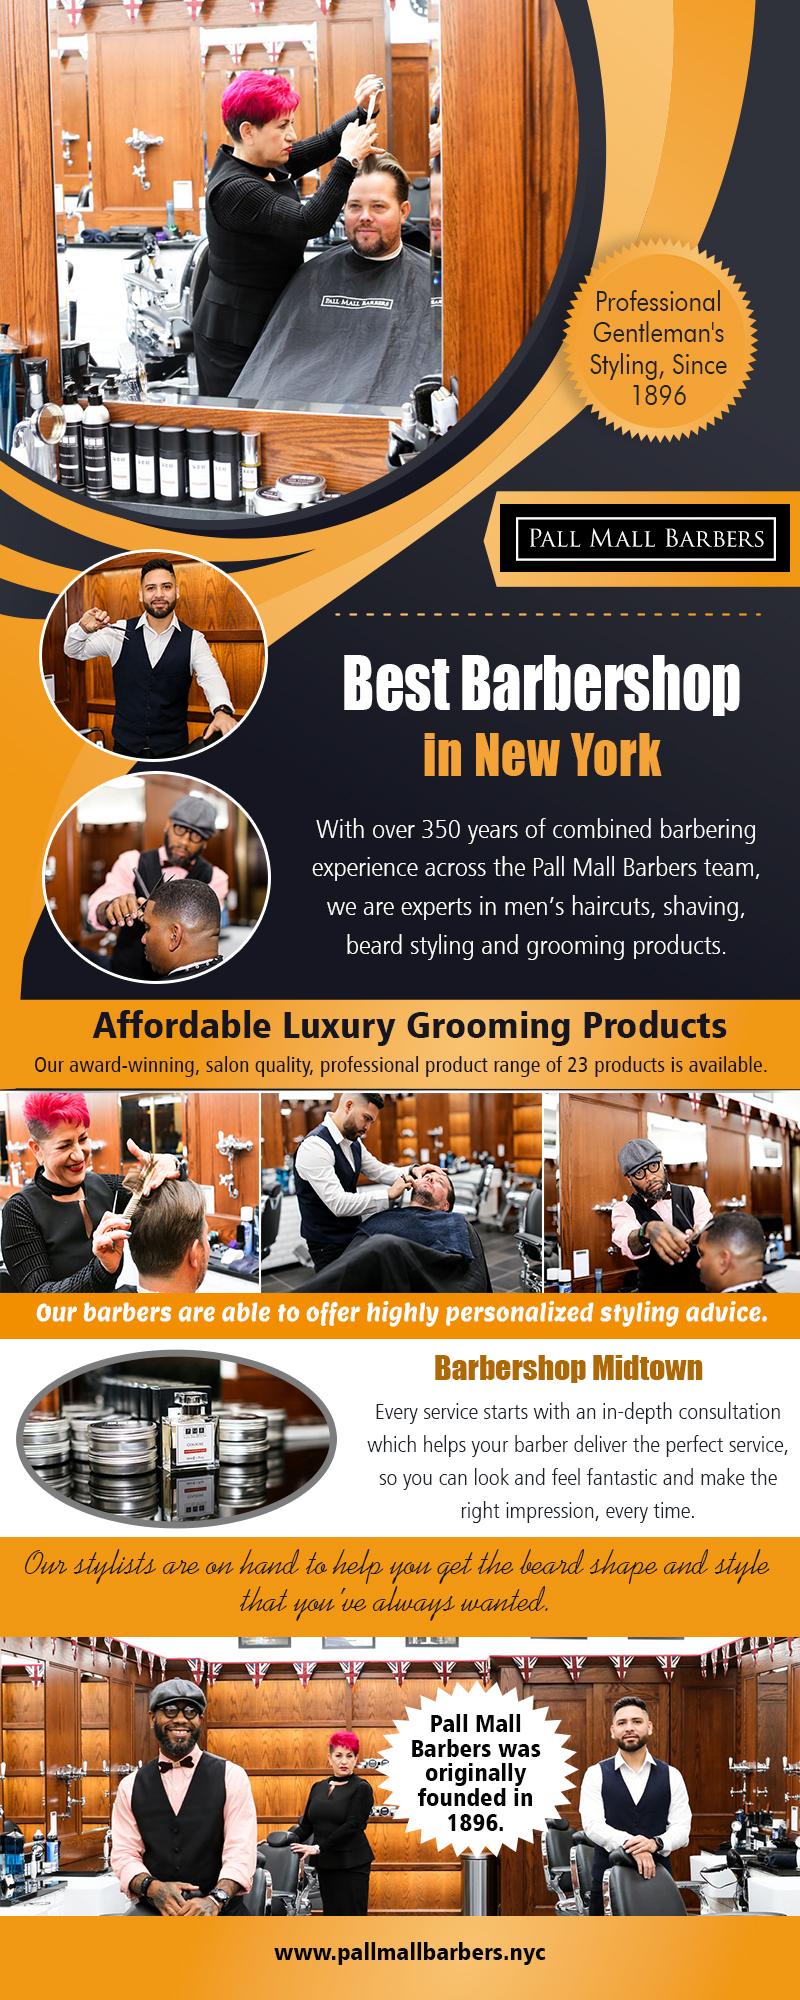 Best Barbershop in New York